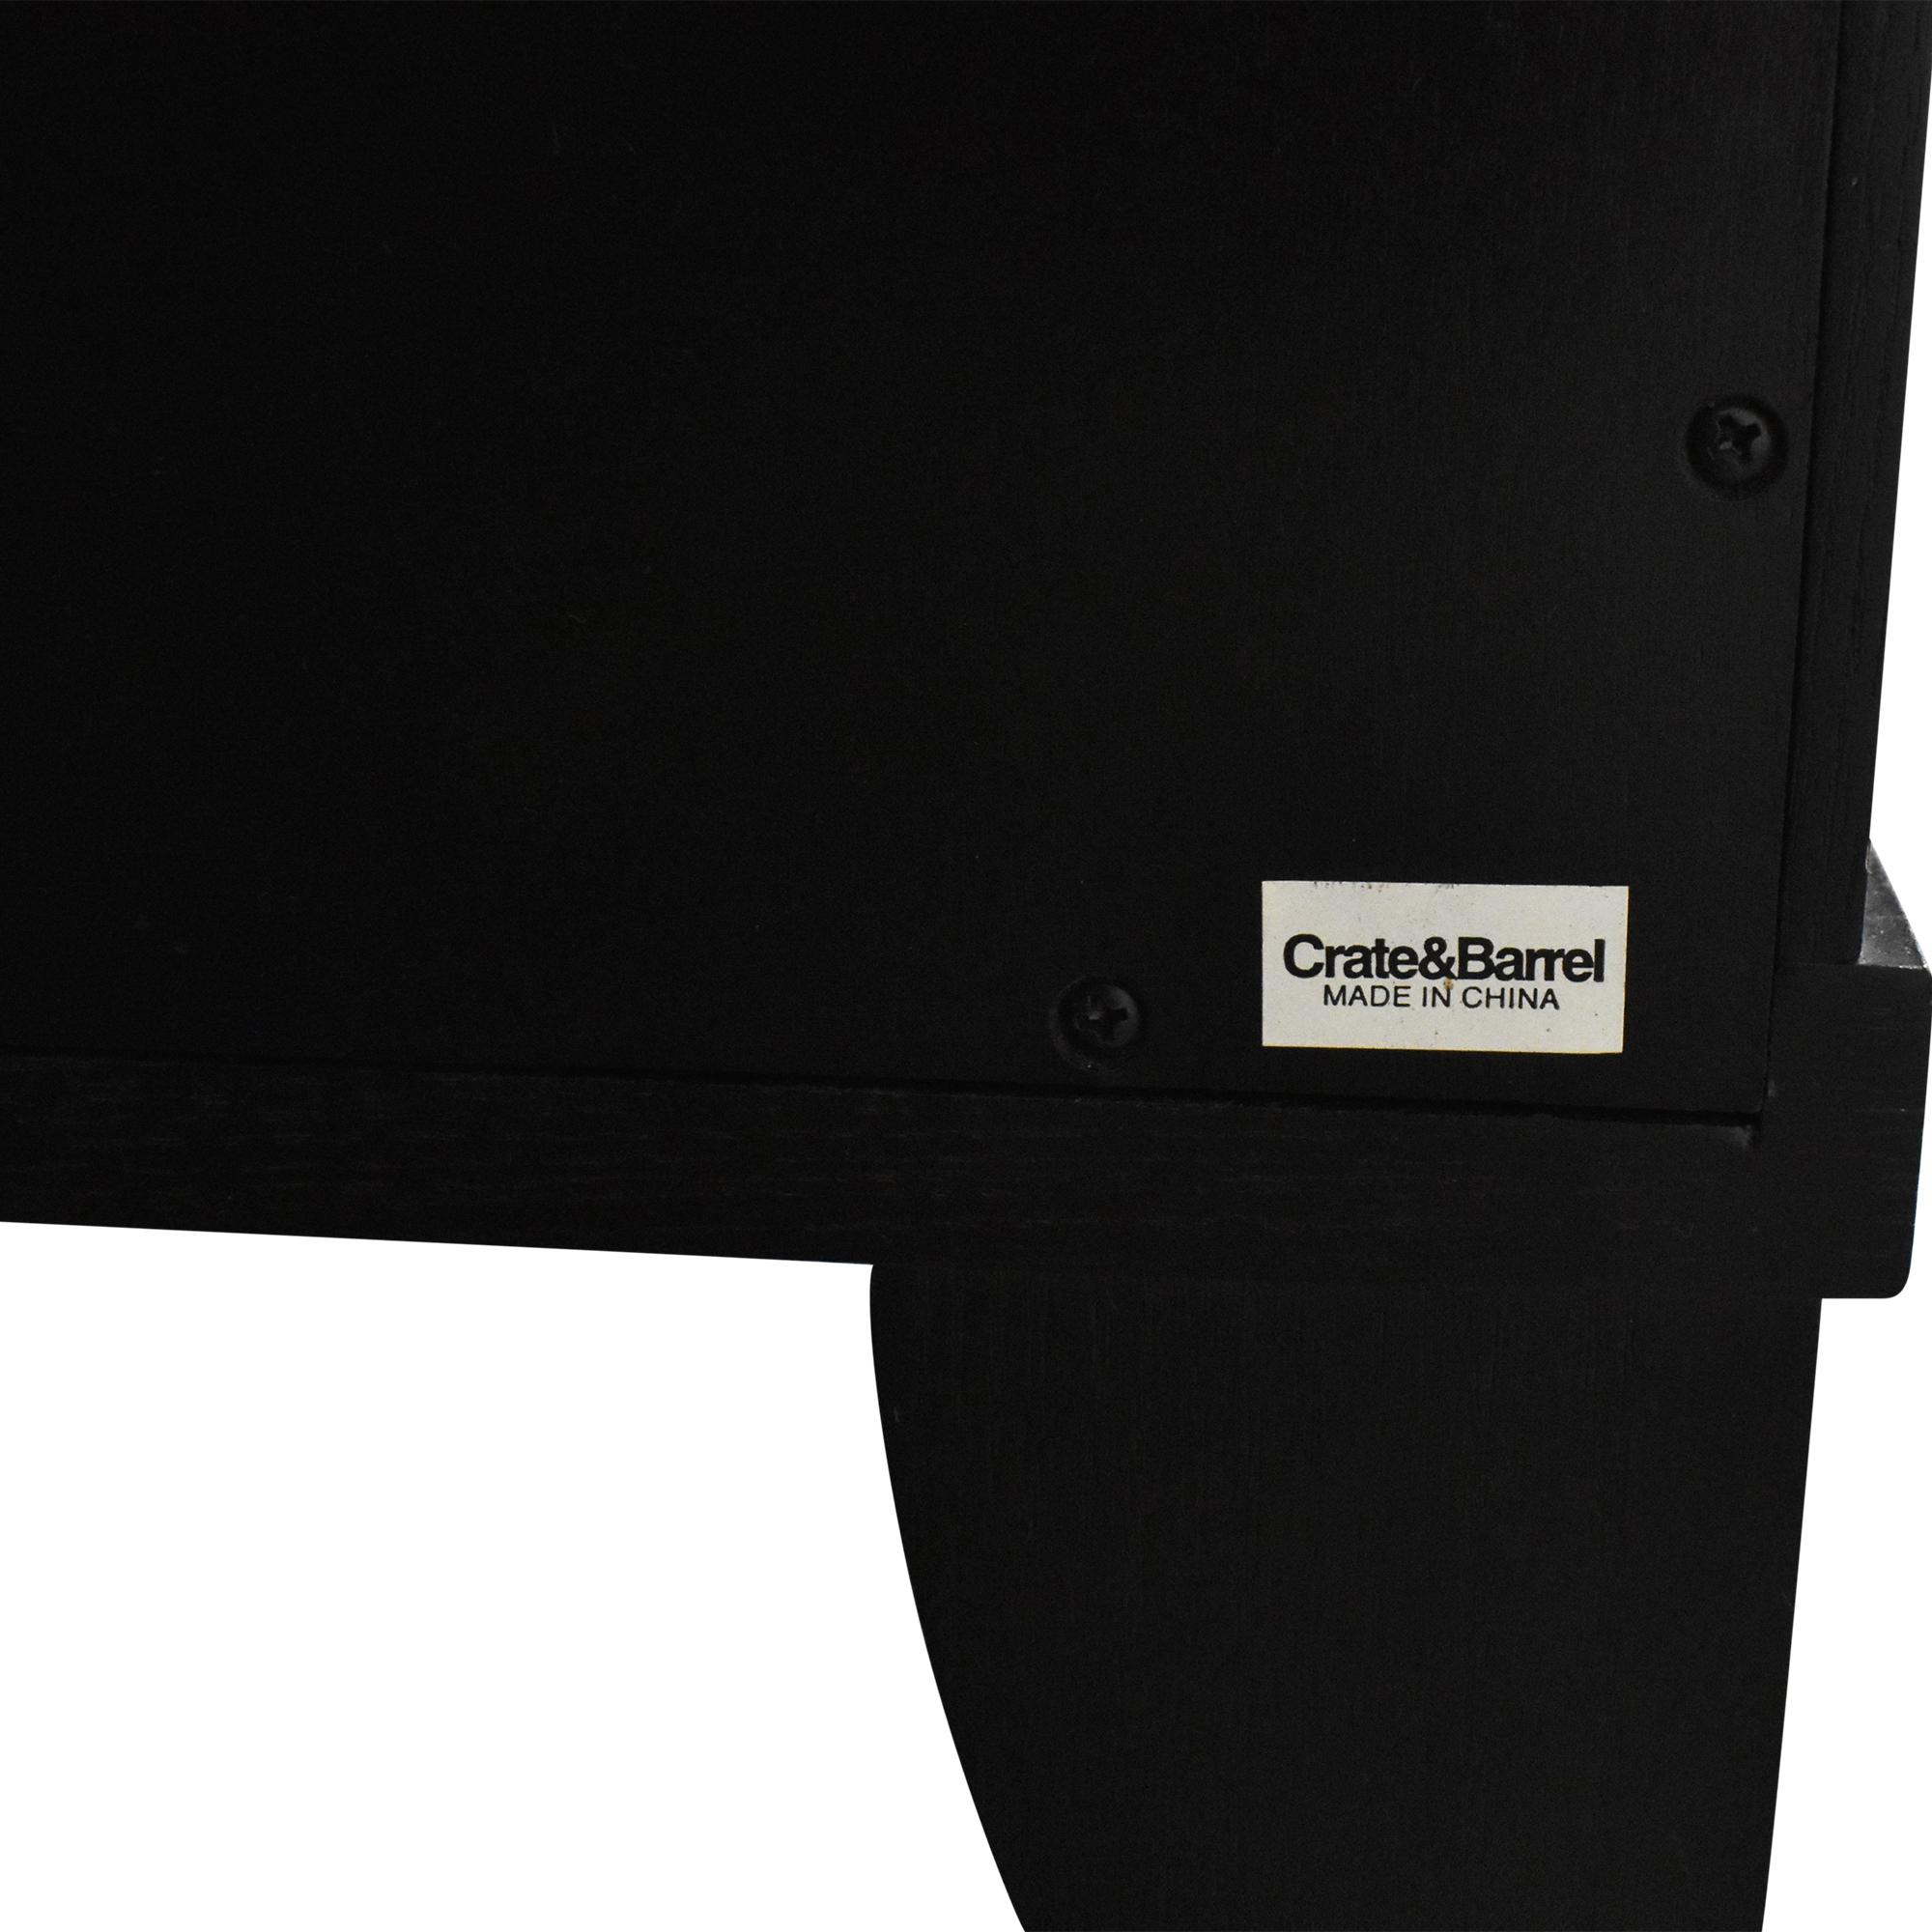 buy Crate & Barrel Portland Sideboard with Wine Grid Crate & Barrel Cabinets & Sideboards